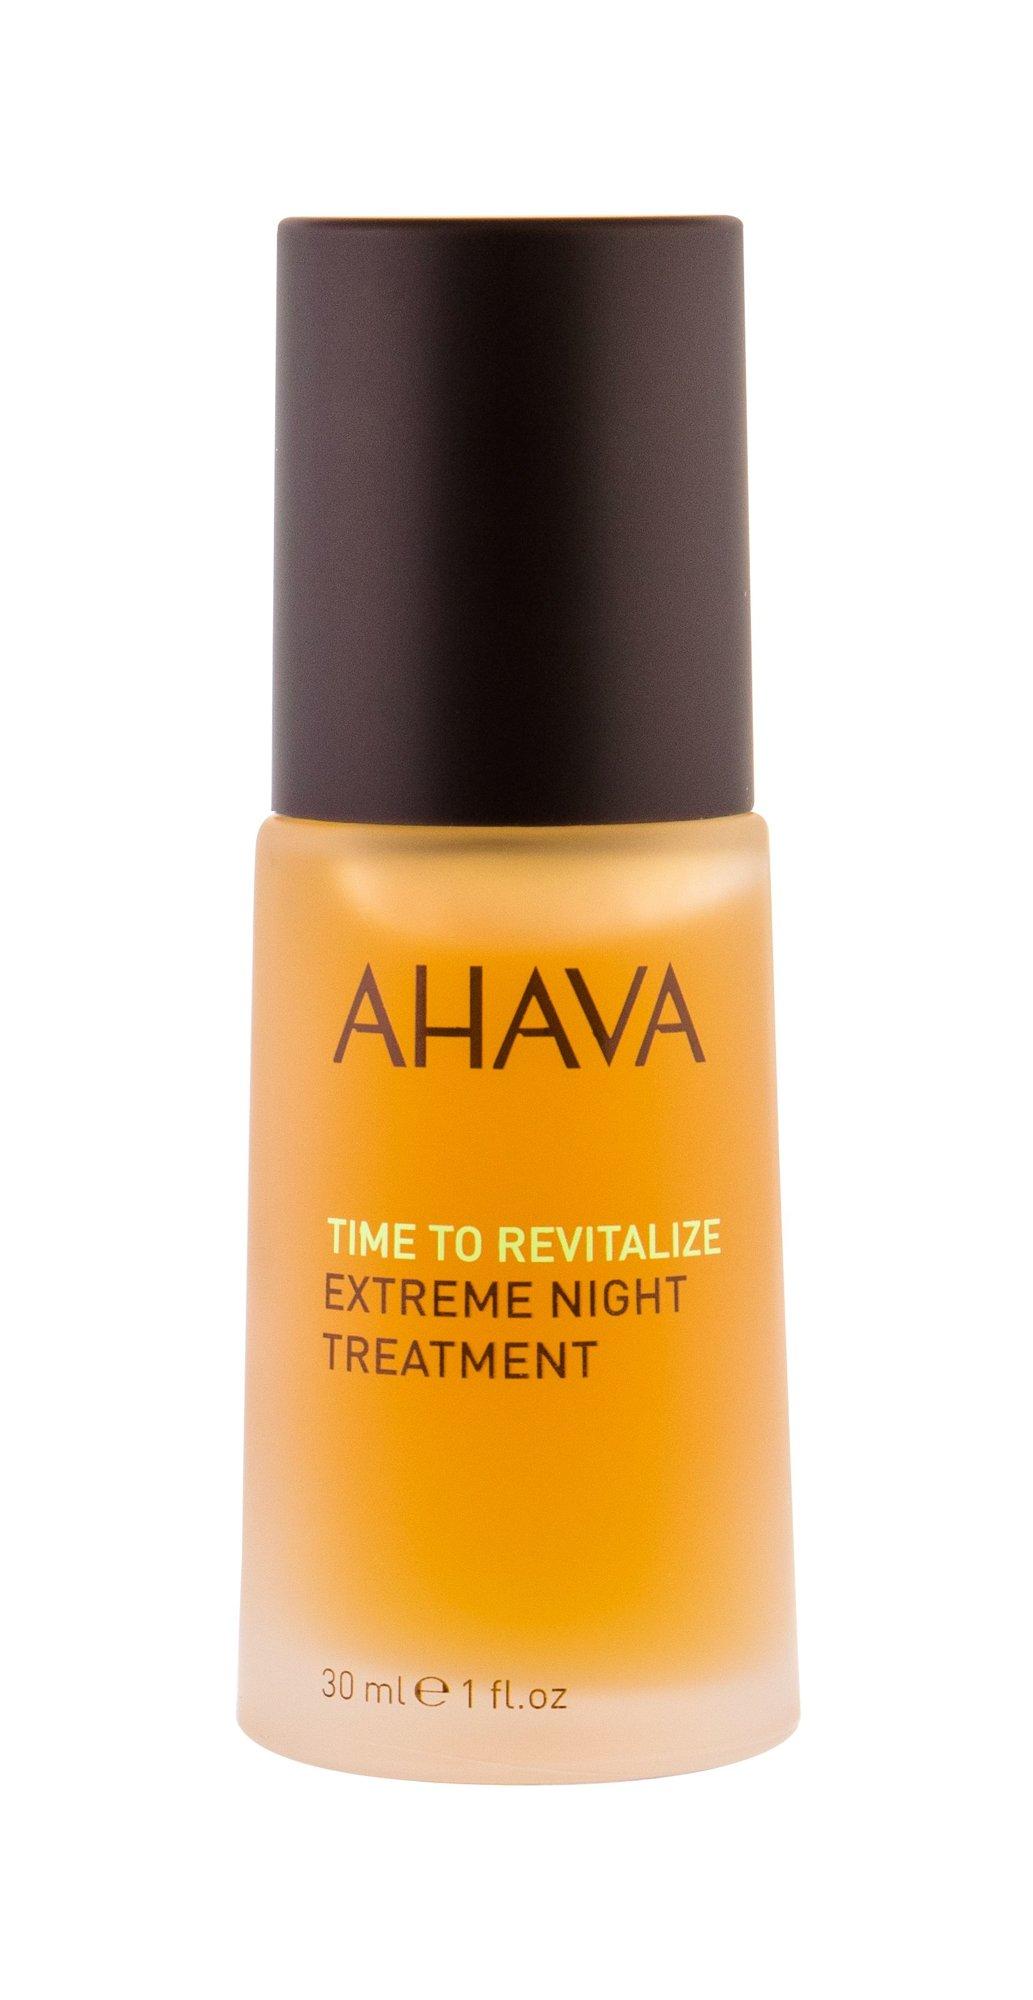 AHAVA Extreme Skin Serum 30ml  Time To Revitalize